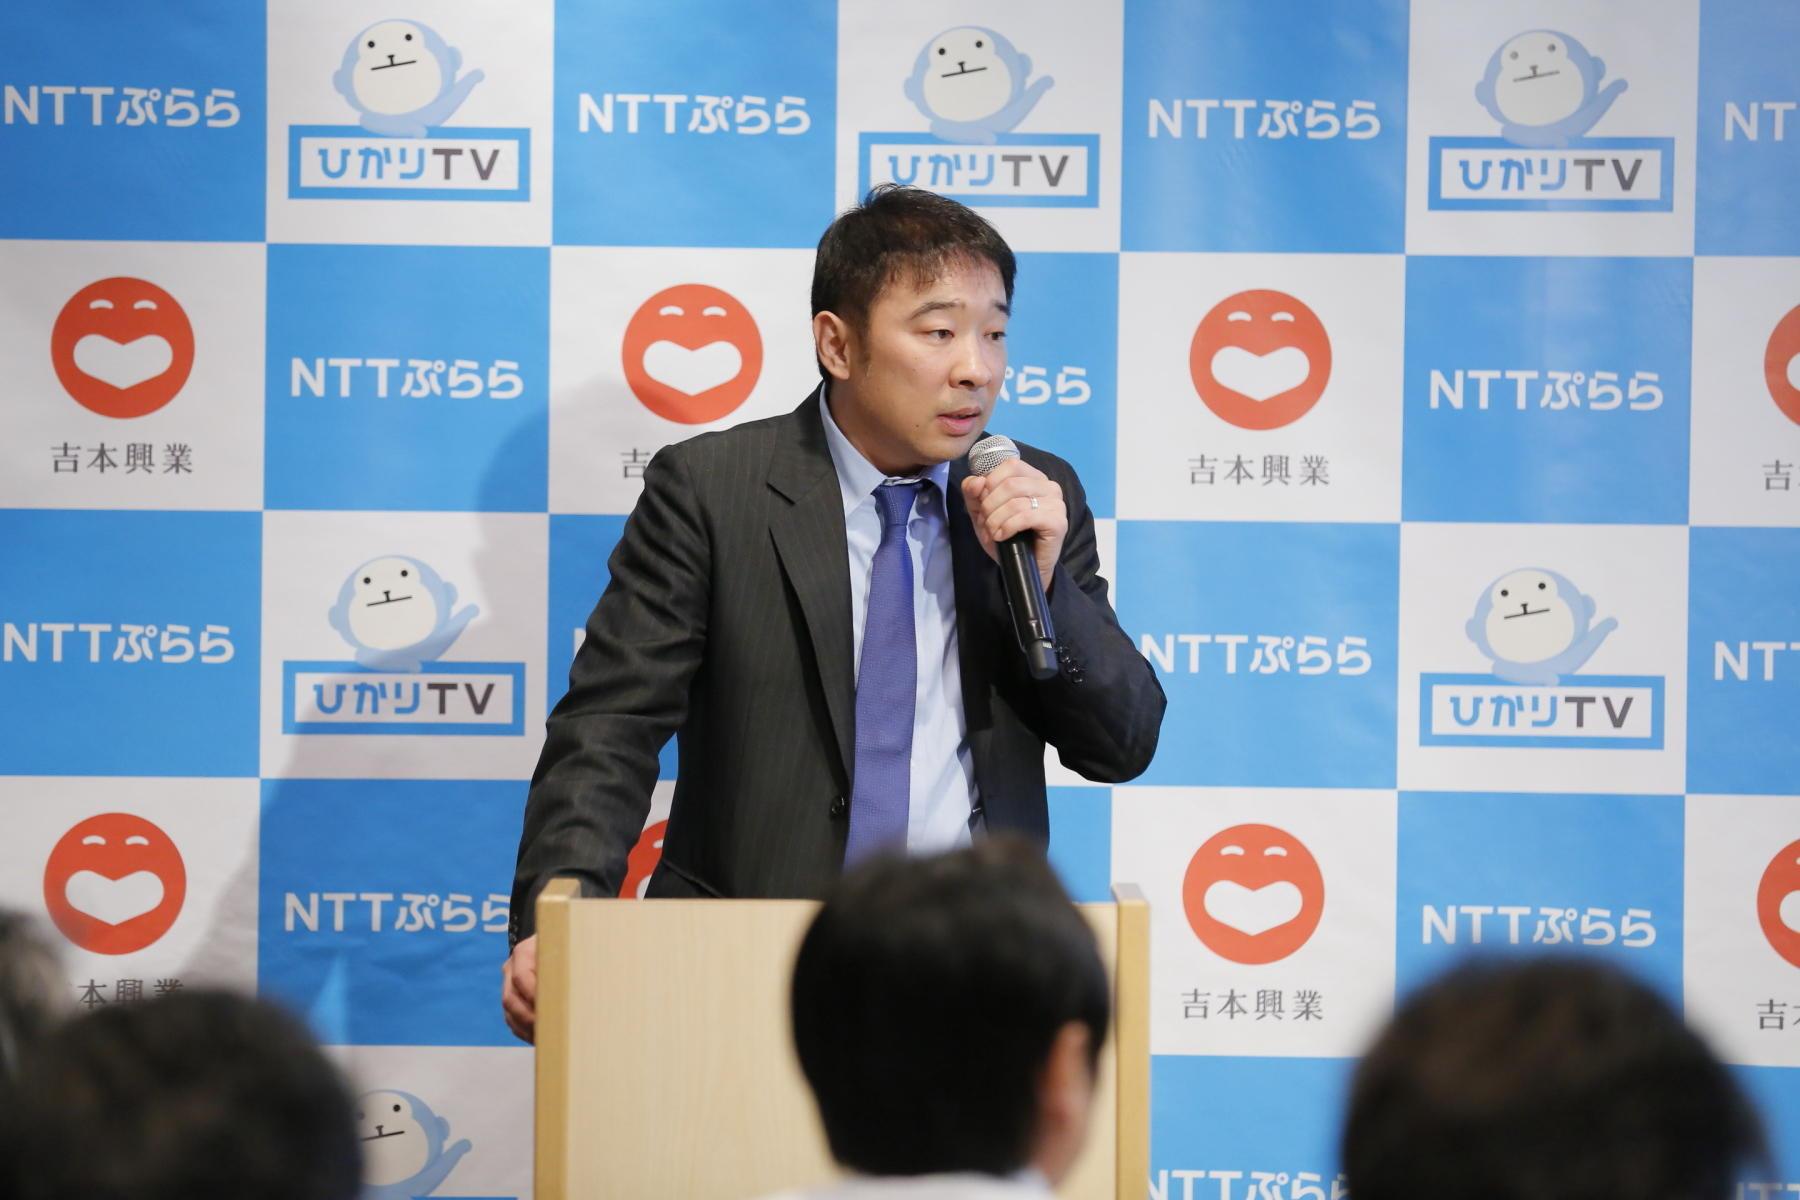 http://news.yoshimoto.co.jp/20170420225221-8f254aa1b4fcbb82a3704d6a4799f89537e82bae.jpg